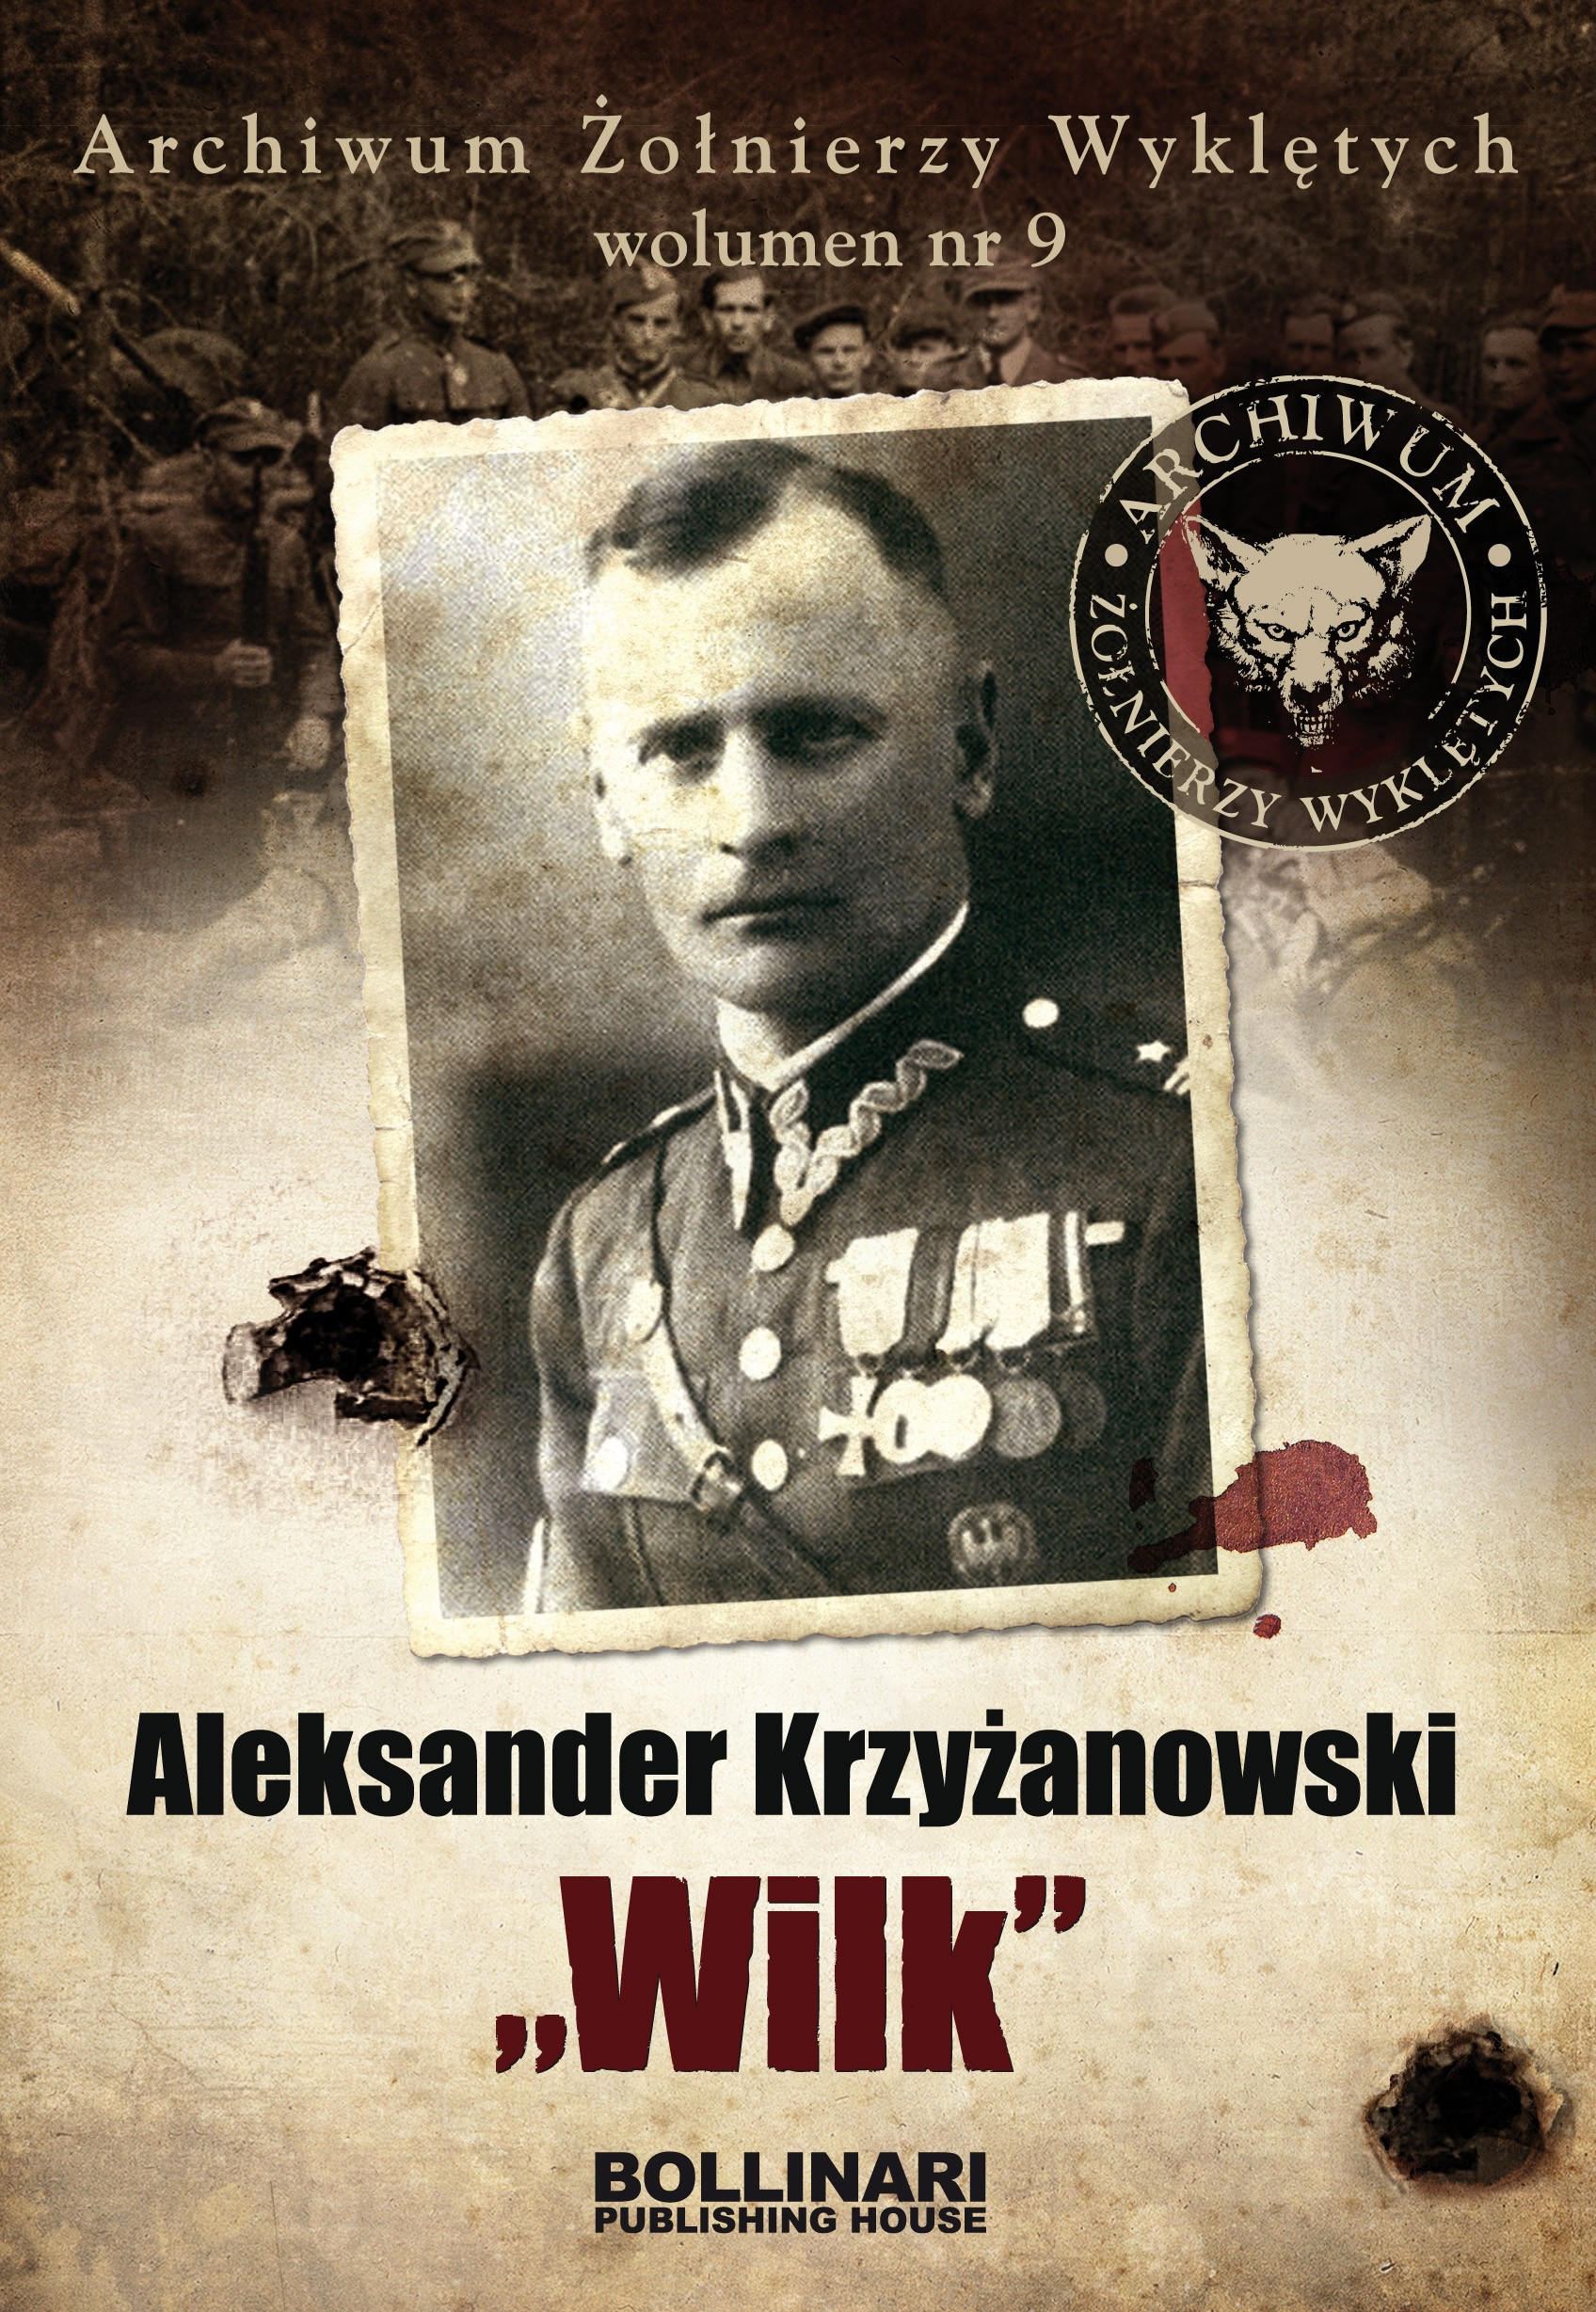 Aleksander Krzyżanowski